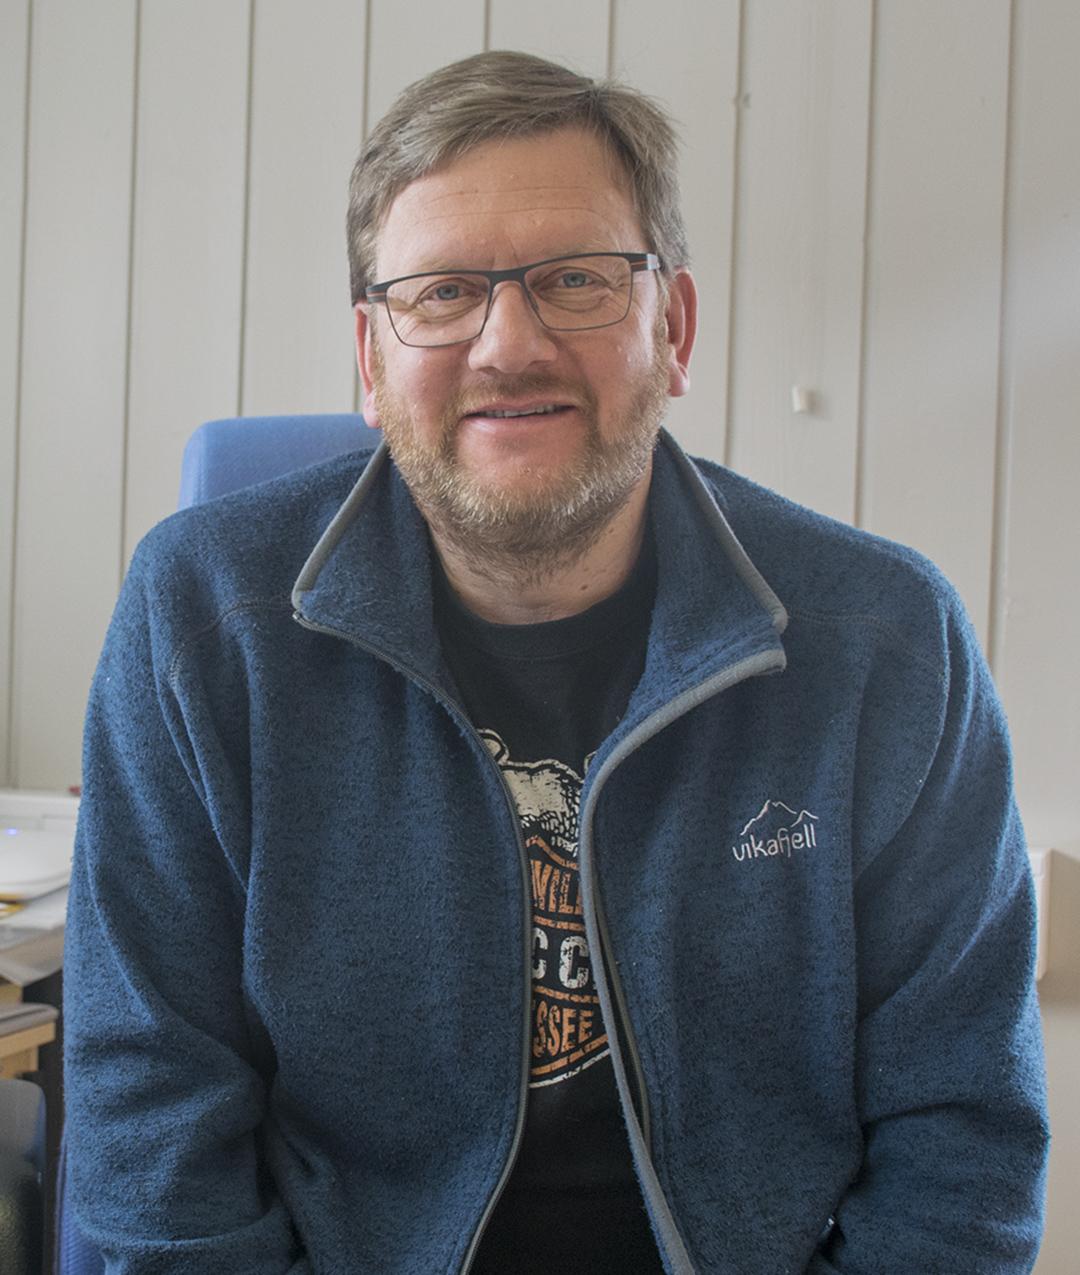 Hans Vandaskog Nesheim, meierisjef Tine Haukeli Meieri